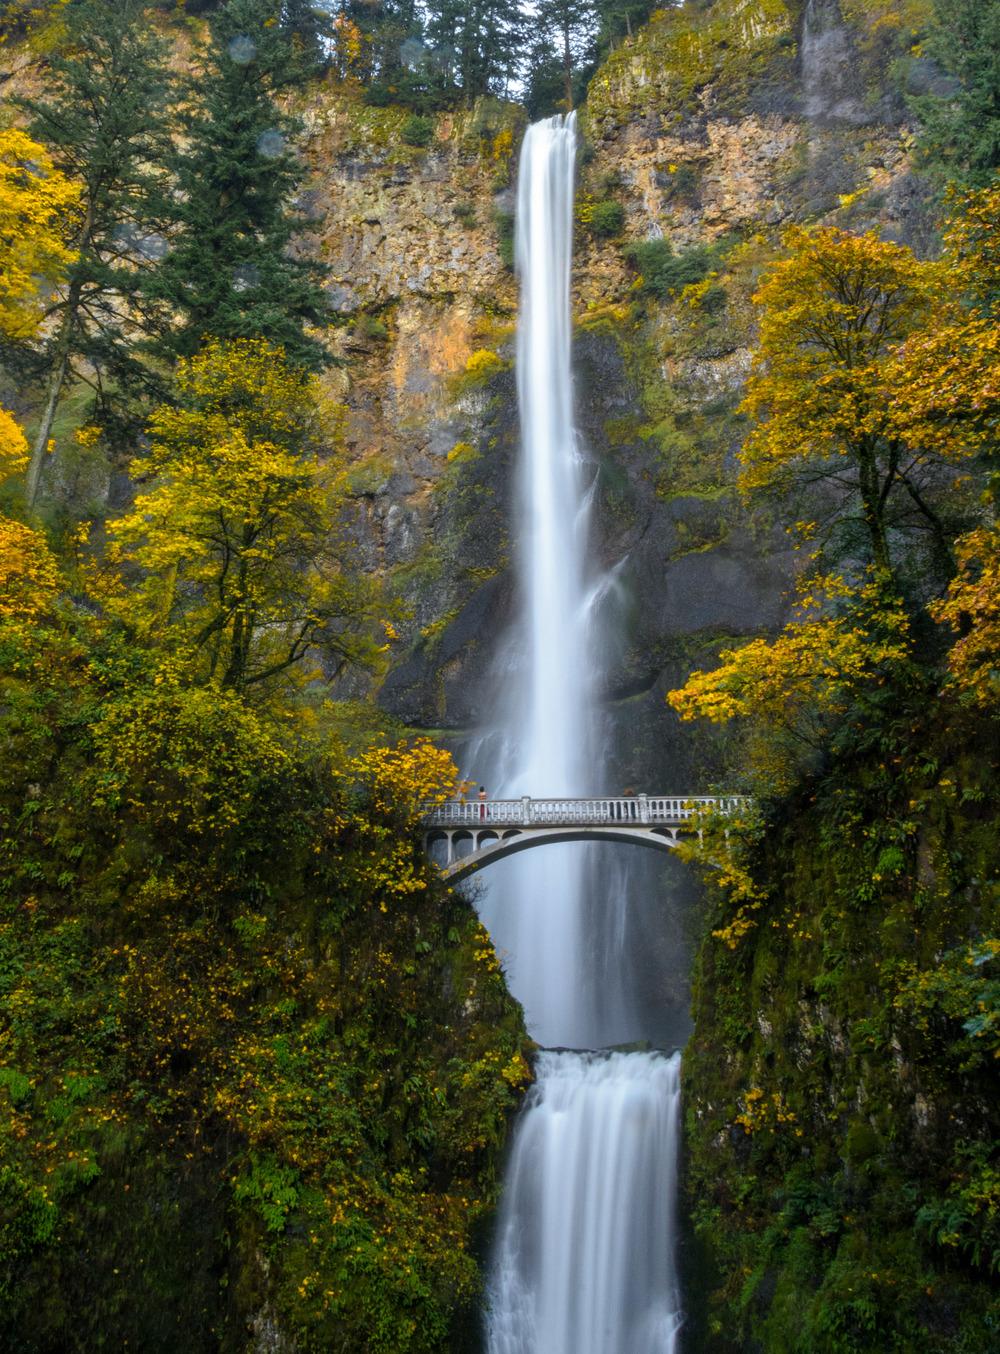 PortlandOregon_20141107_389.jpg